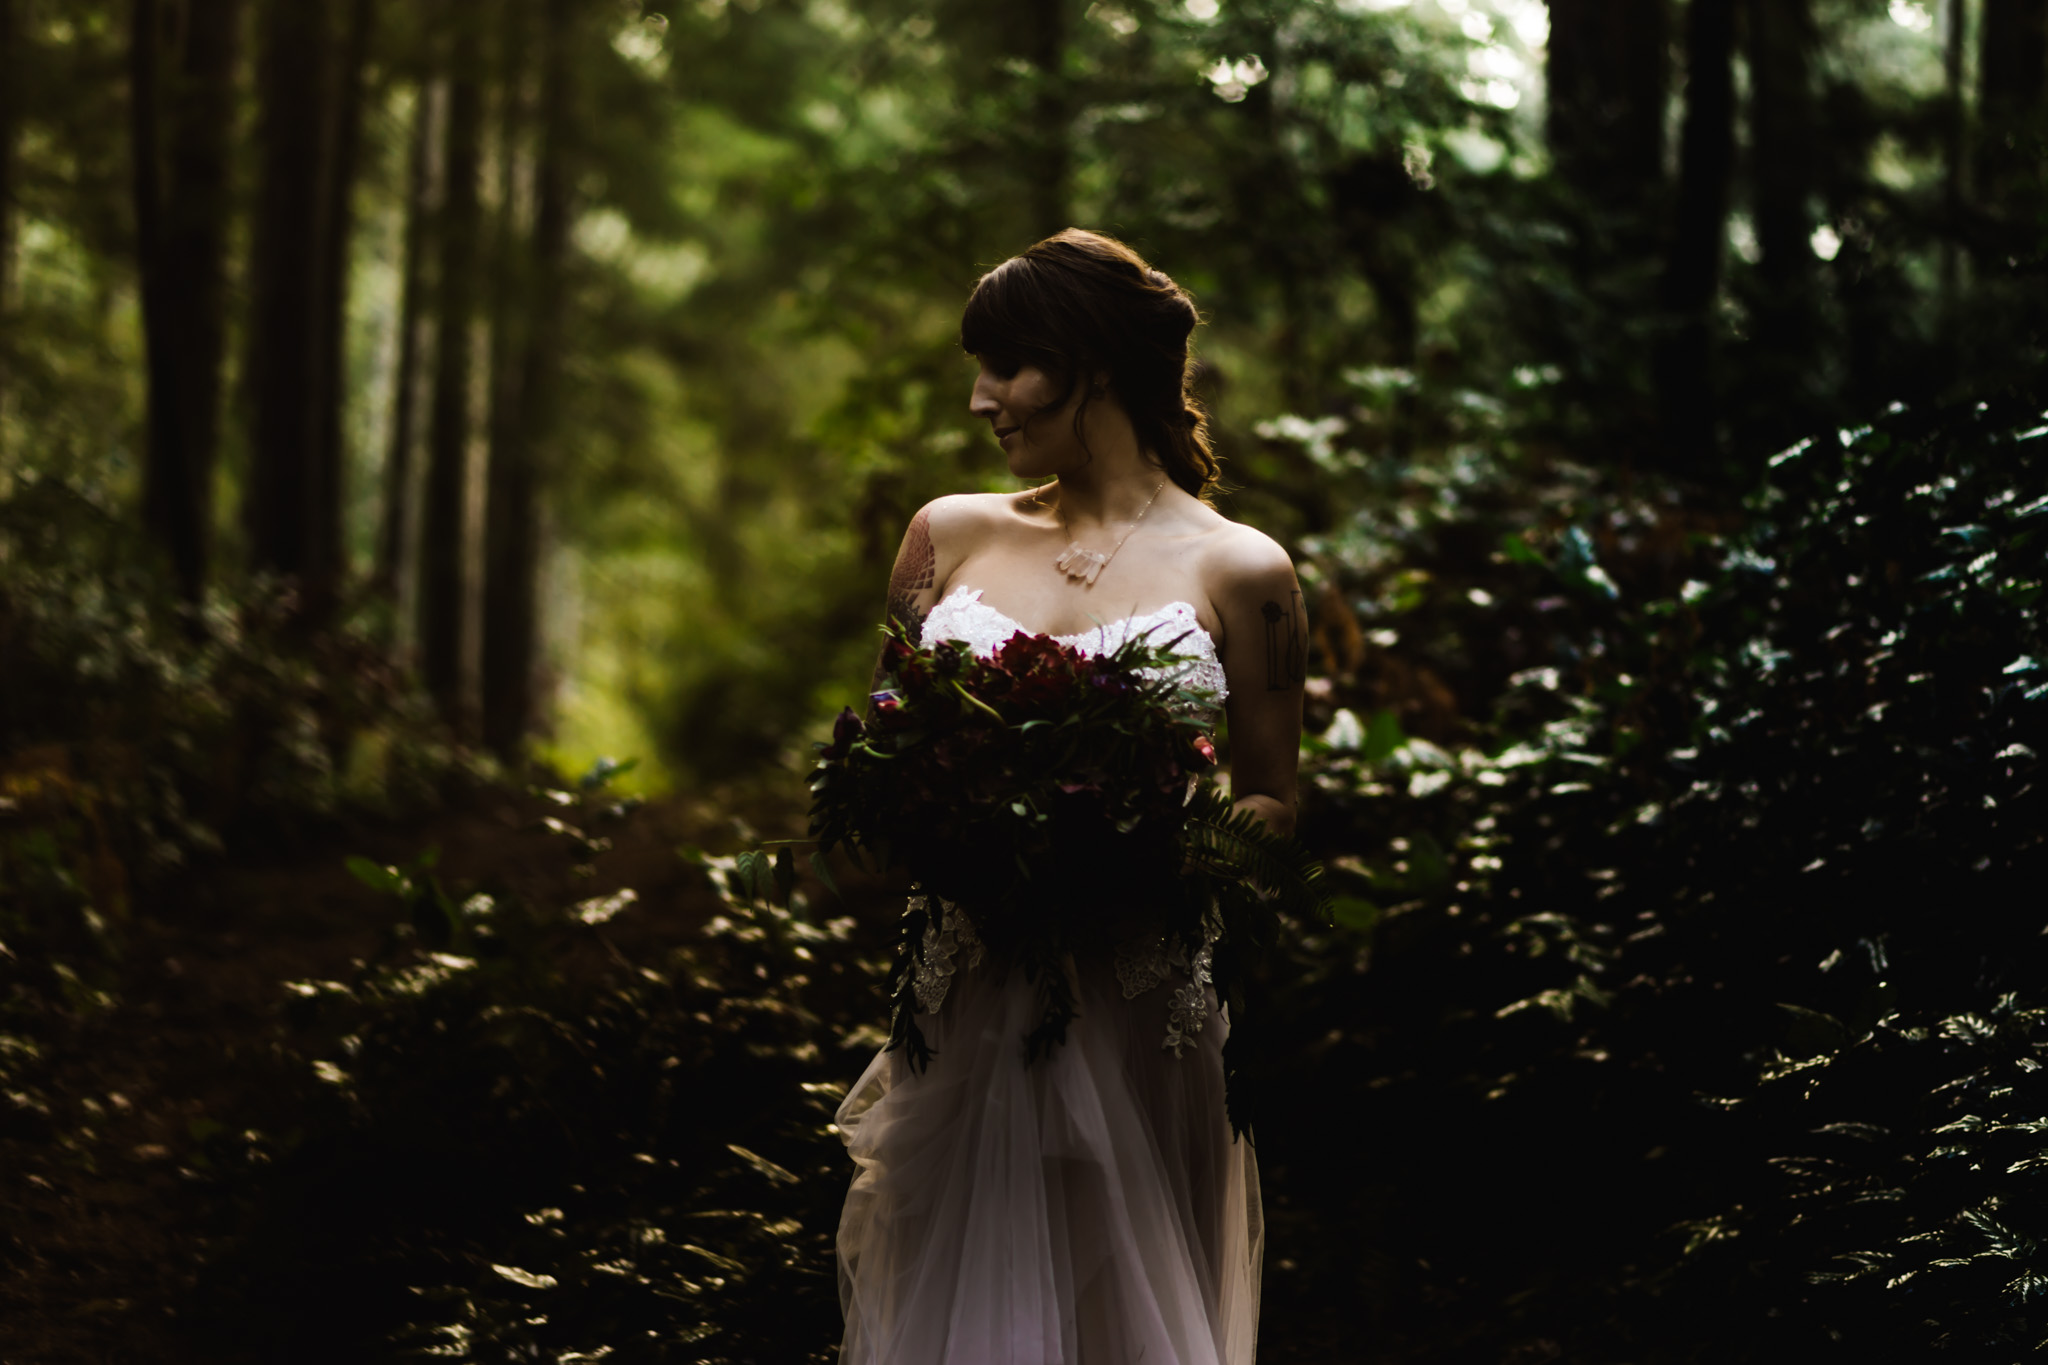 DannieMelissaWit_AbeillePhotography.com_BARE_Bridal_COLLABORATION-75.jpg